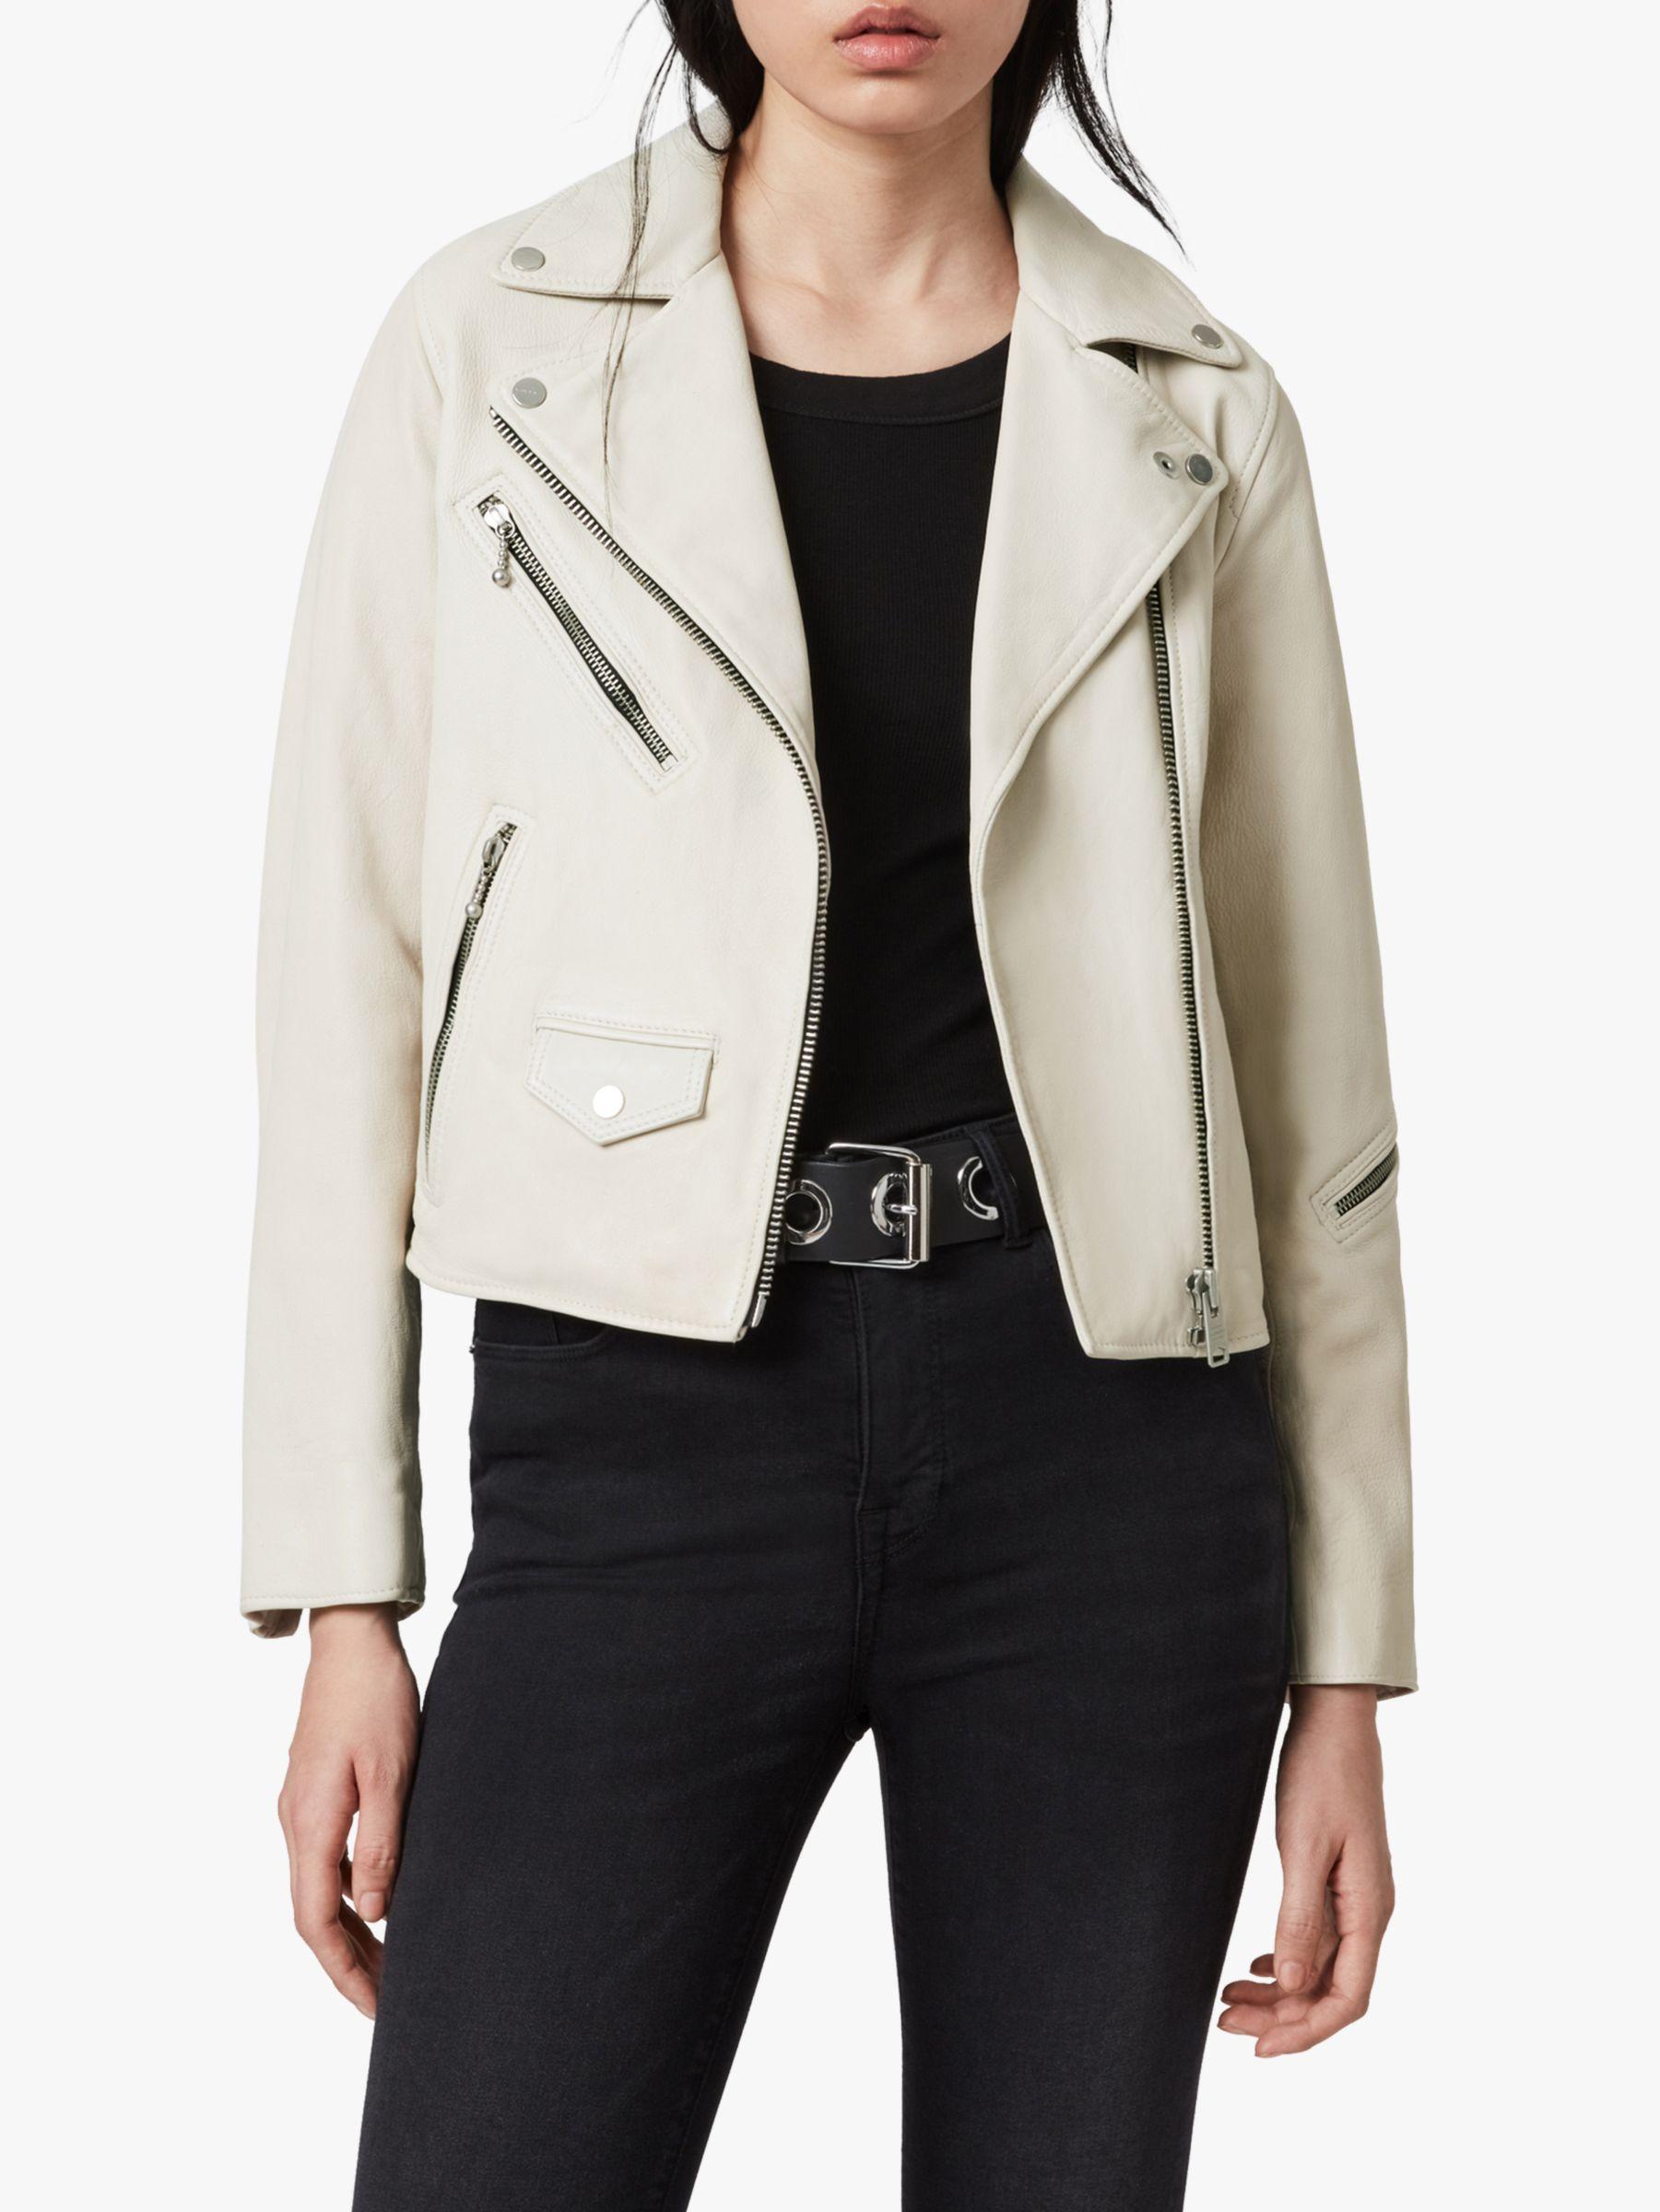 AllSaints AllSaints Riley Leather Biker Jacket, White